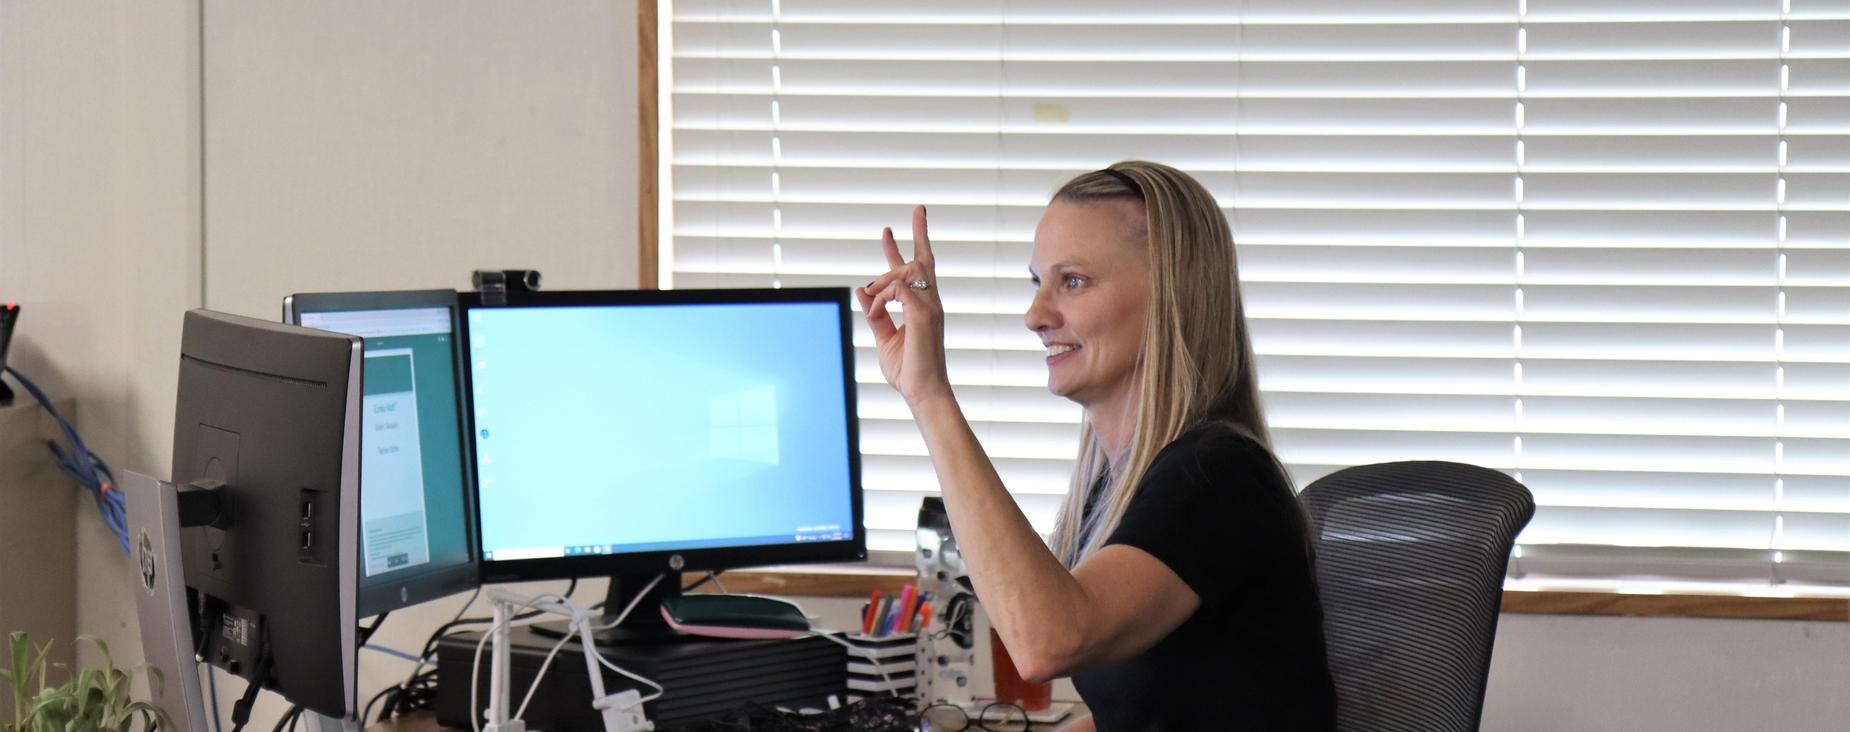 Teacher using sign language while teaching online